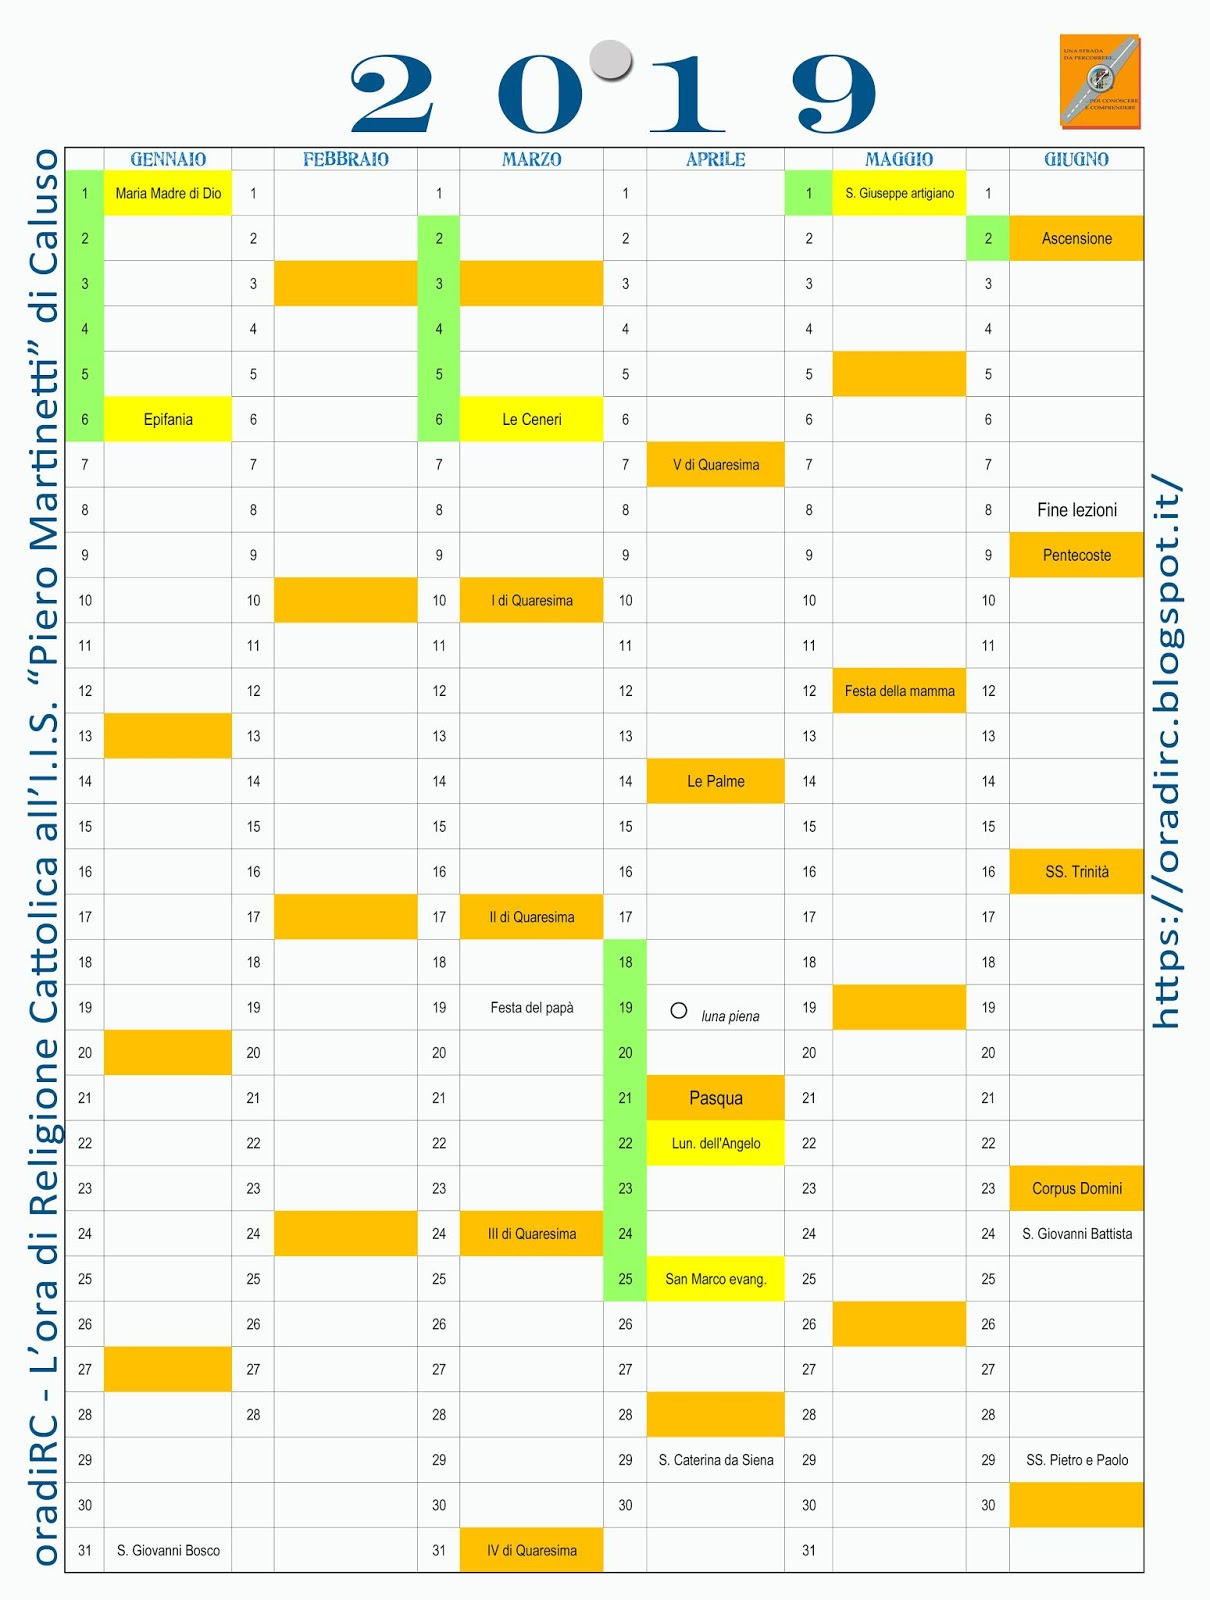 Calendario Cattolico.Oradirc L Ora Di Religione Cattolica Calendario 2019